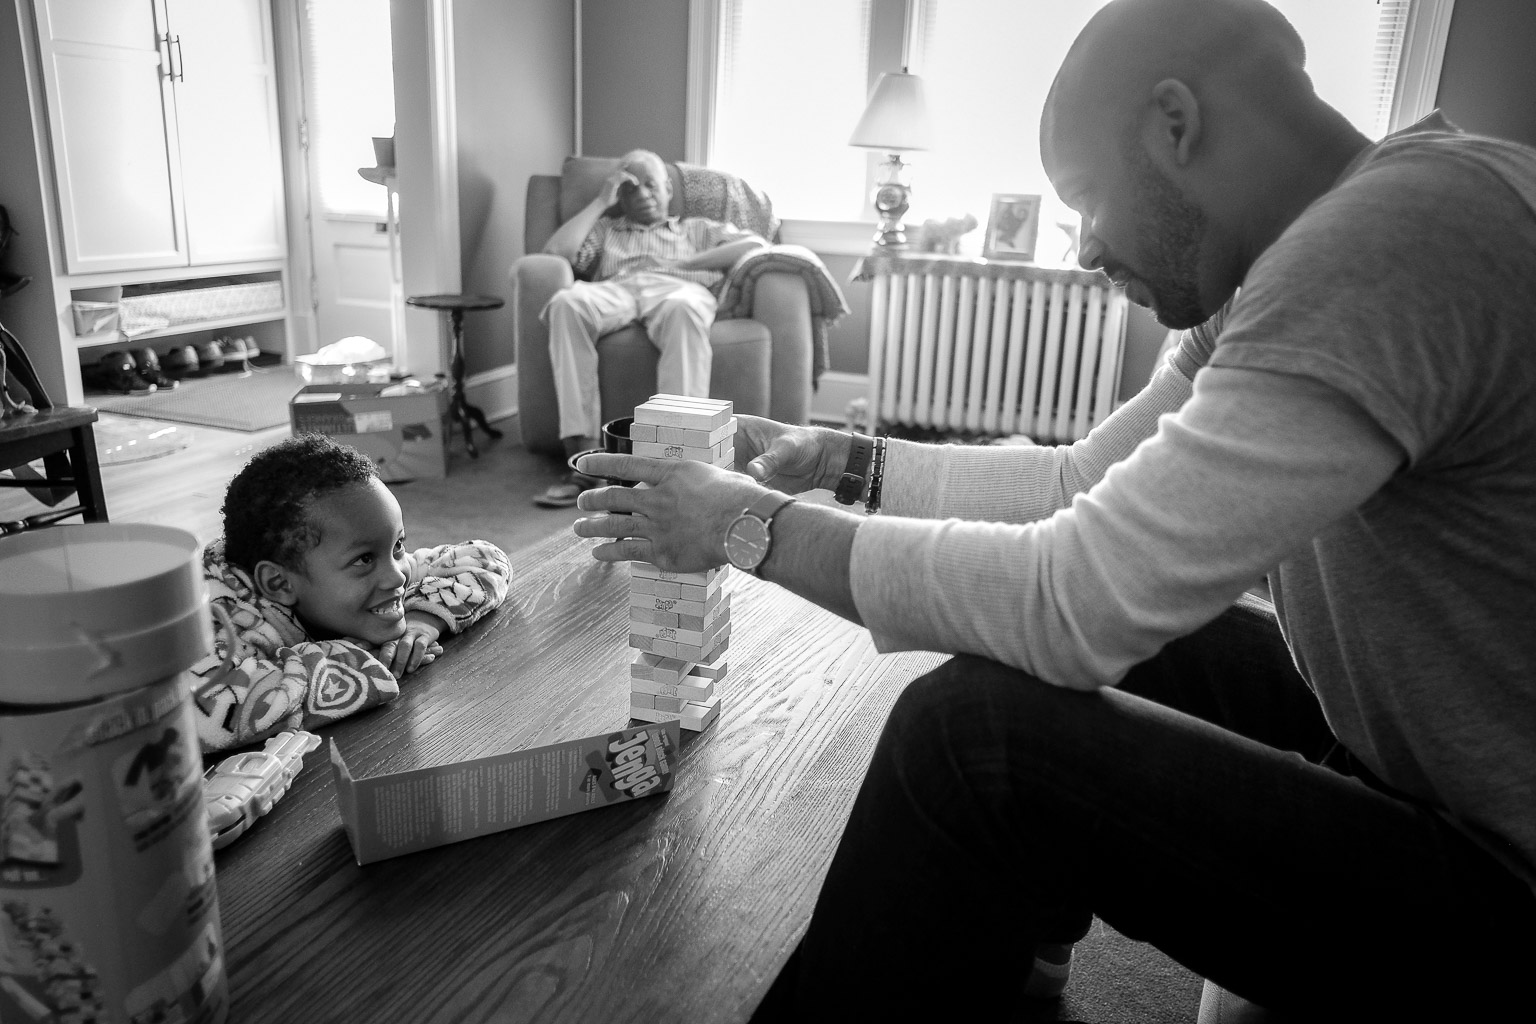 Lenzy_Ruffin_Photography_Family_Portrait_Photographer_Washington_DC_4-8-17-017.jpg